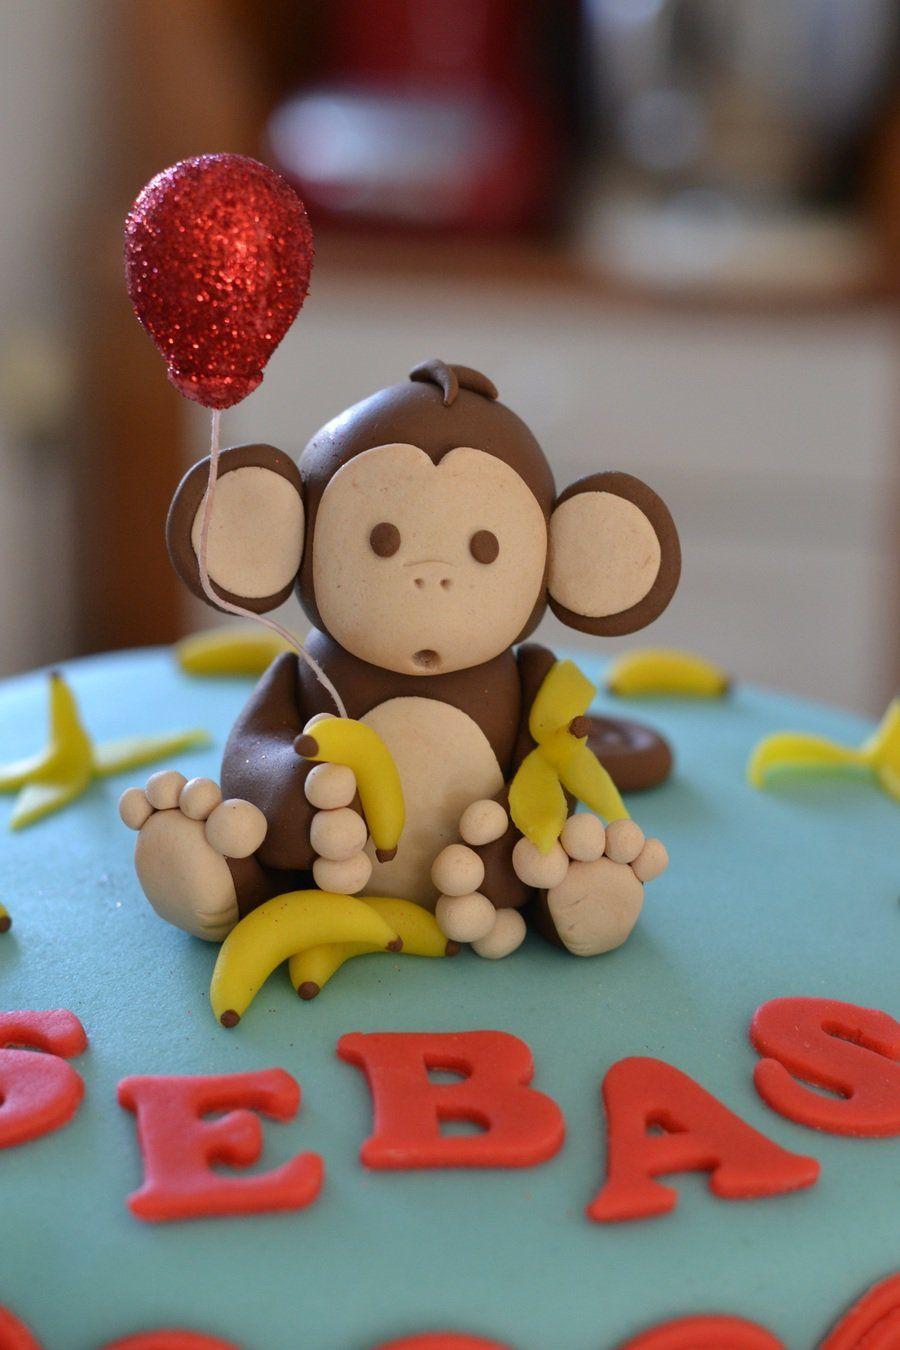 Little Monkey Birthday Cake Monkey and balloon made from fondant